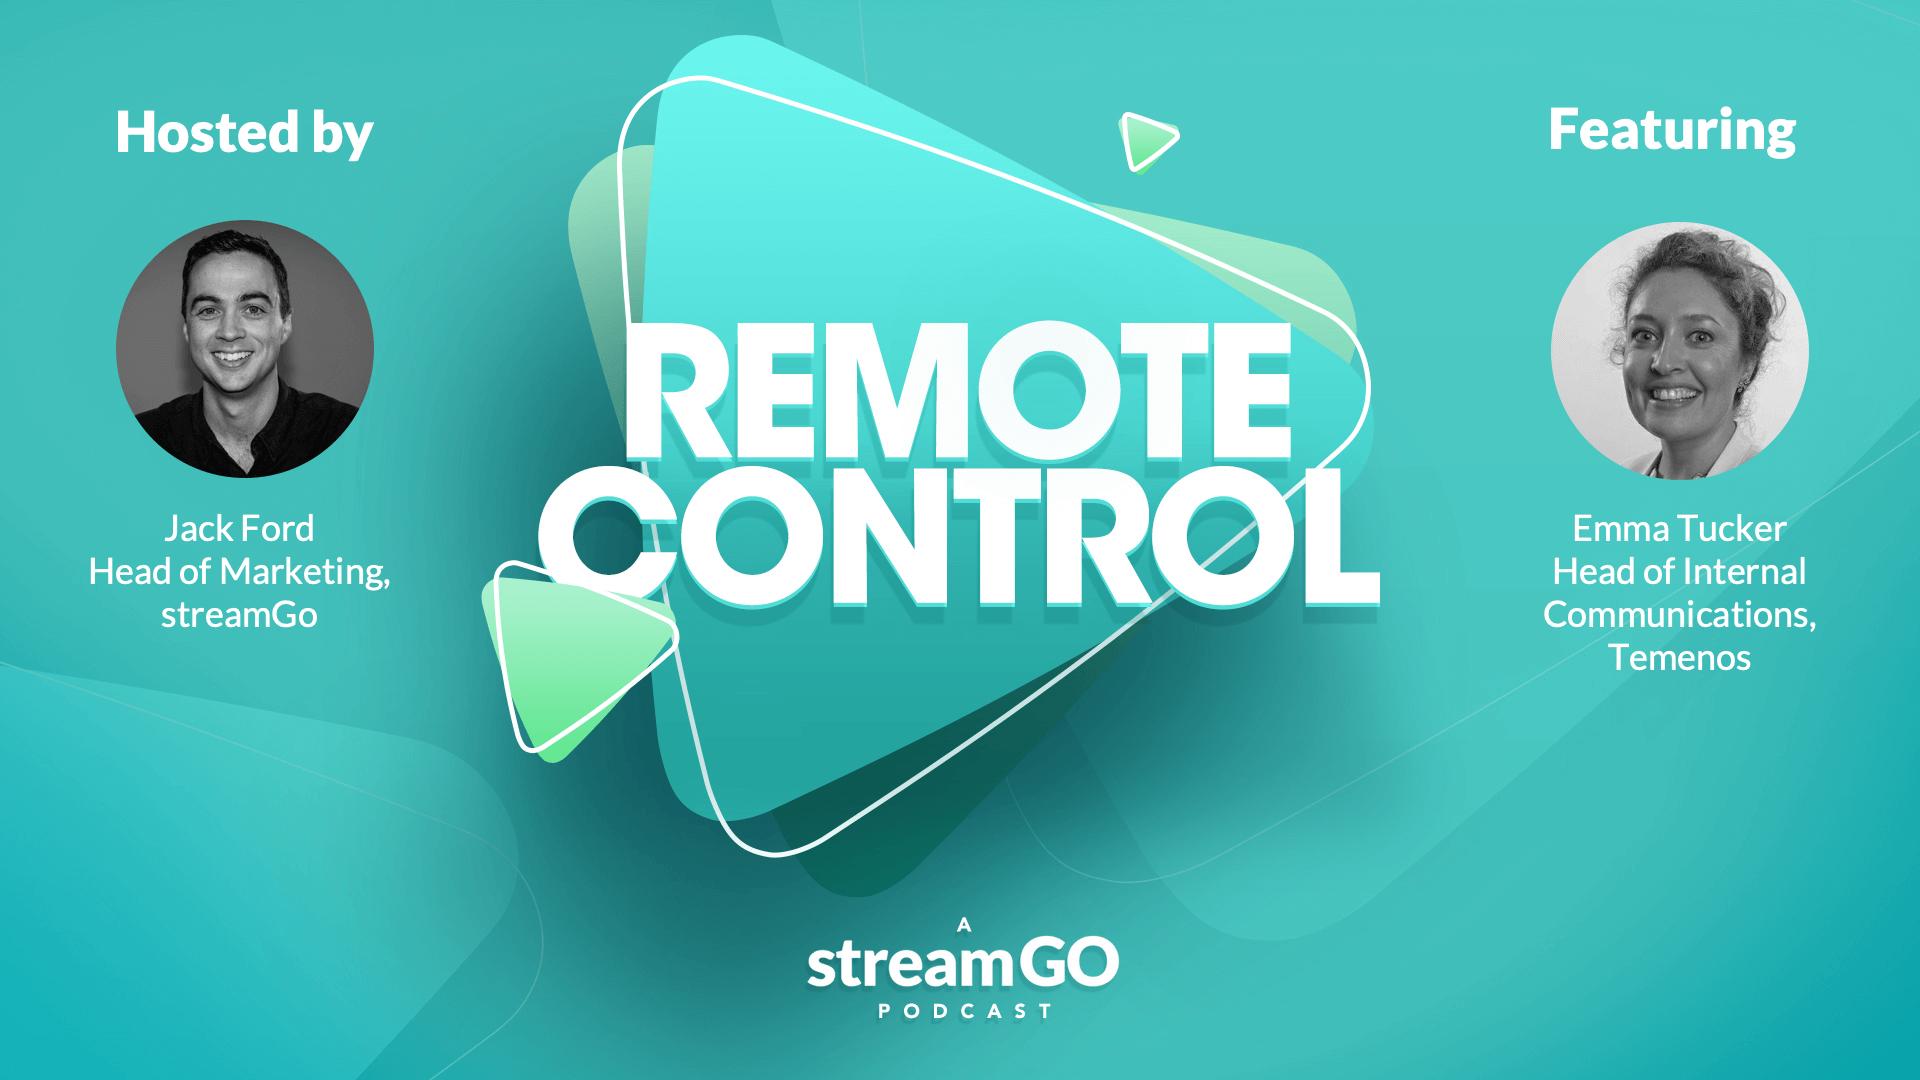 Remote Control - Emma Tucker